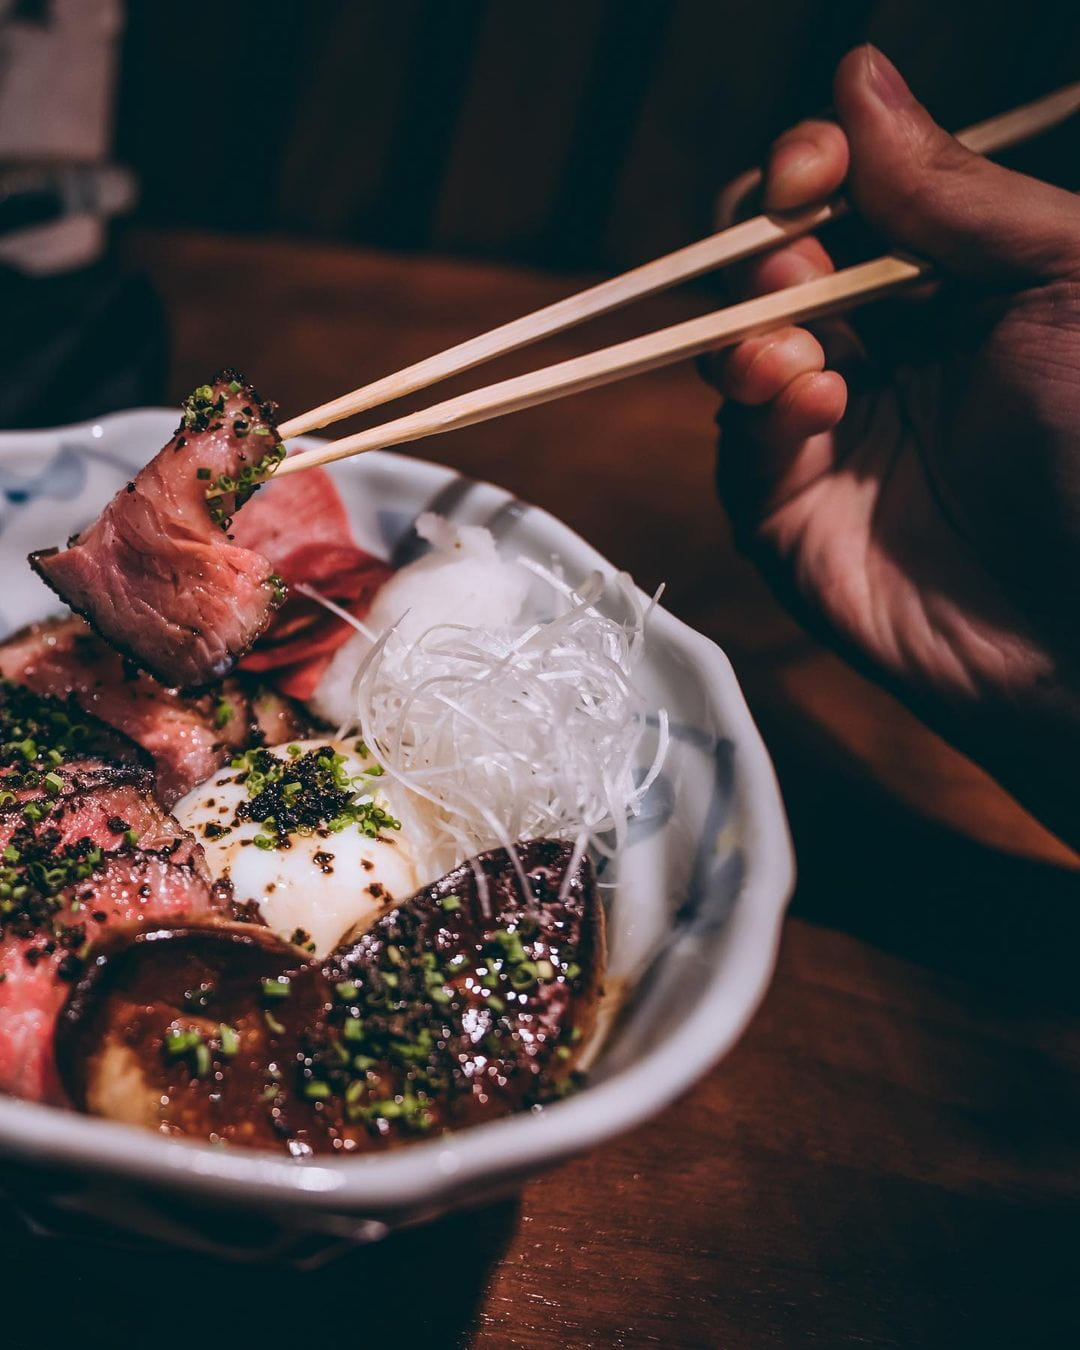 citi gourmet pleasures - USHIO Sumiyaki & Sake Bar